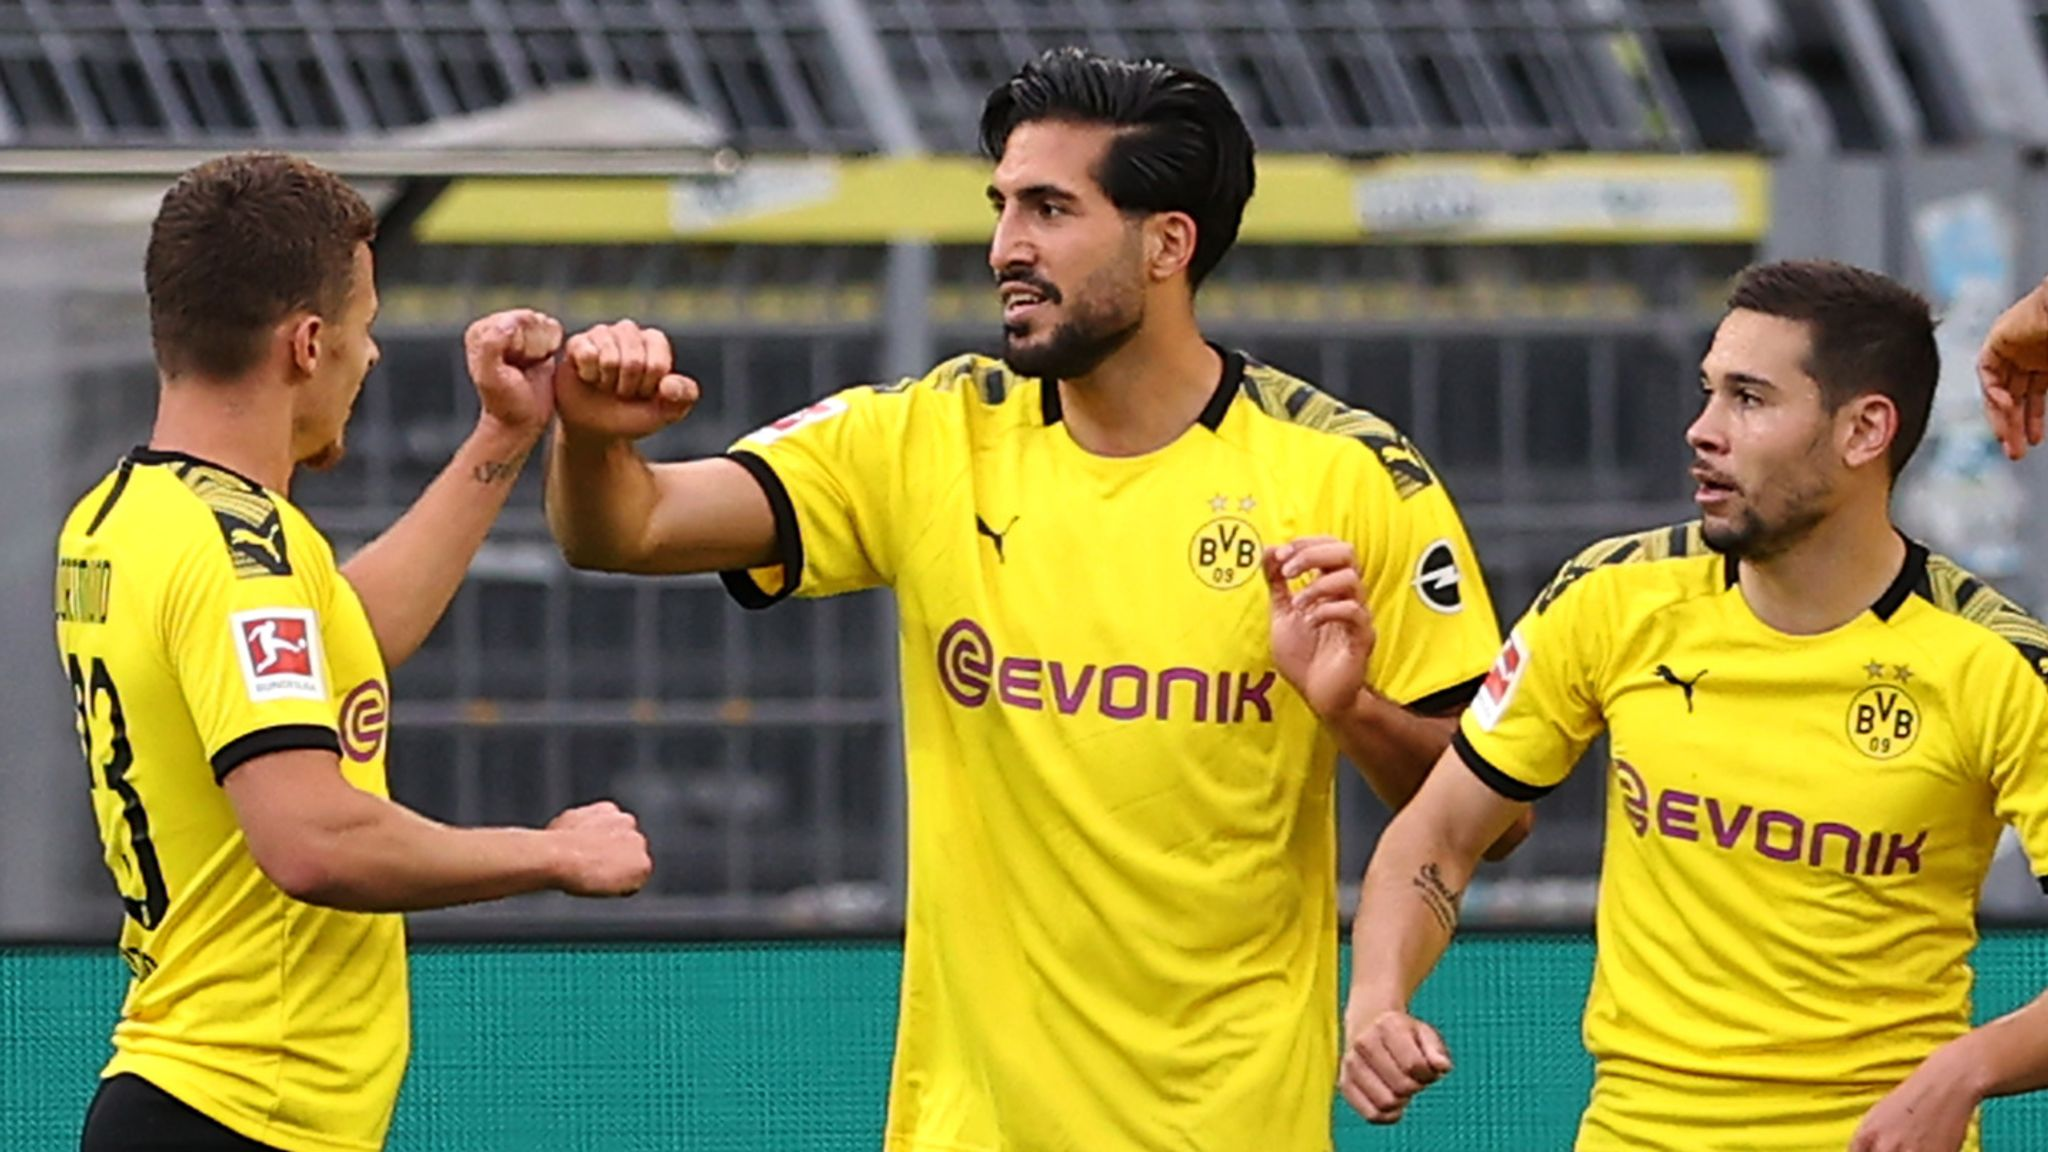 Borussia Dortmund 1-0 Hertha Berlin: Emre Can the unlikely match-winner